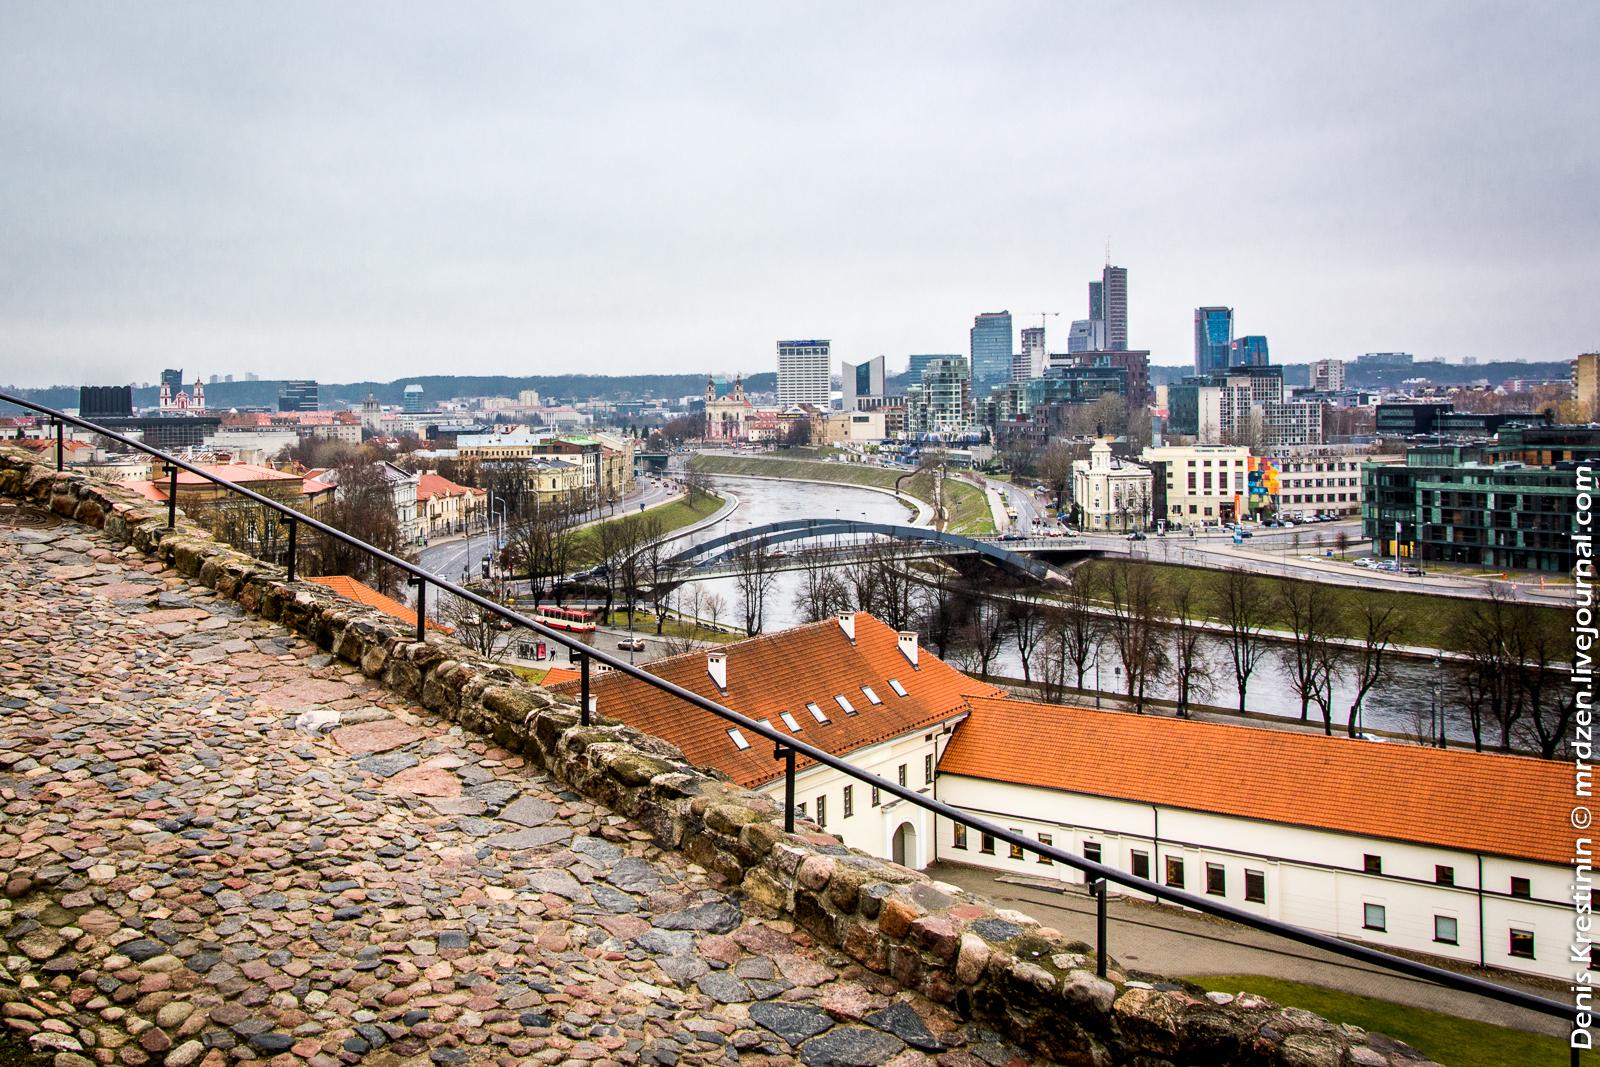 Вильнюс. Замковая гора. Вид на деловой центр.